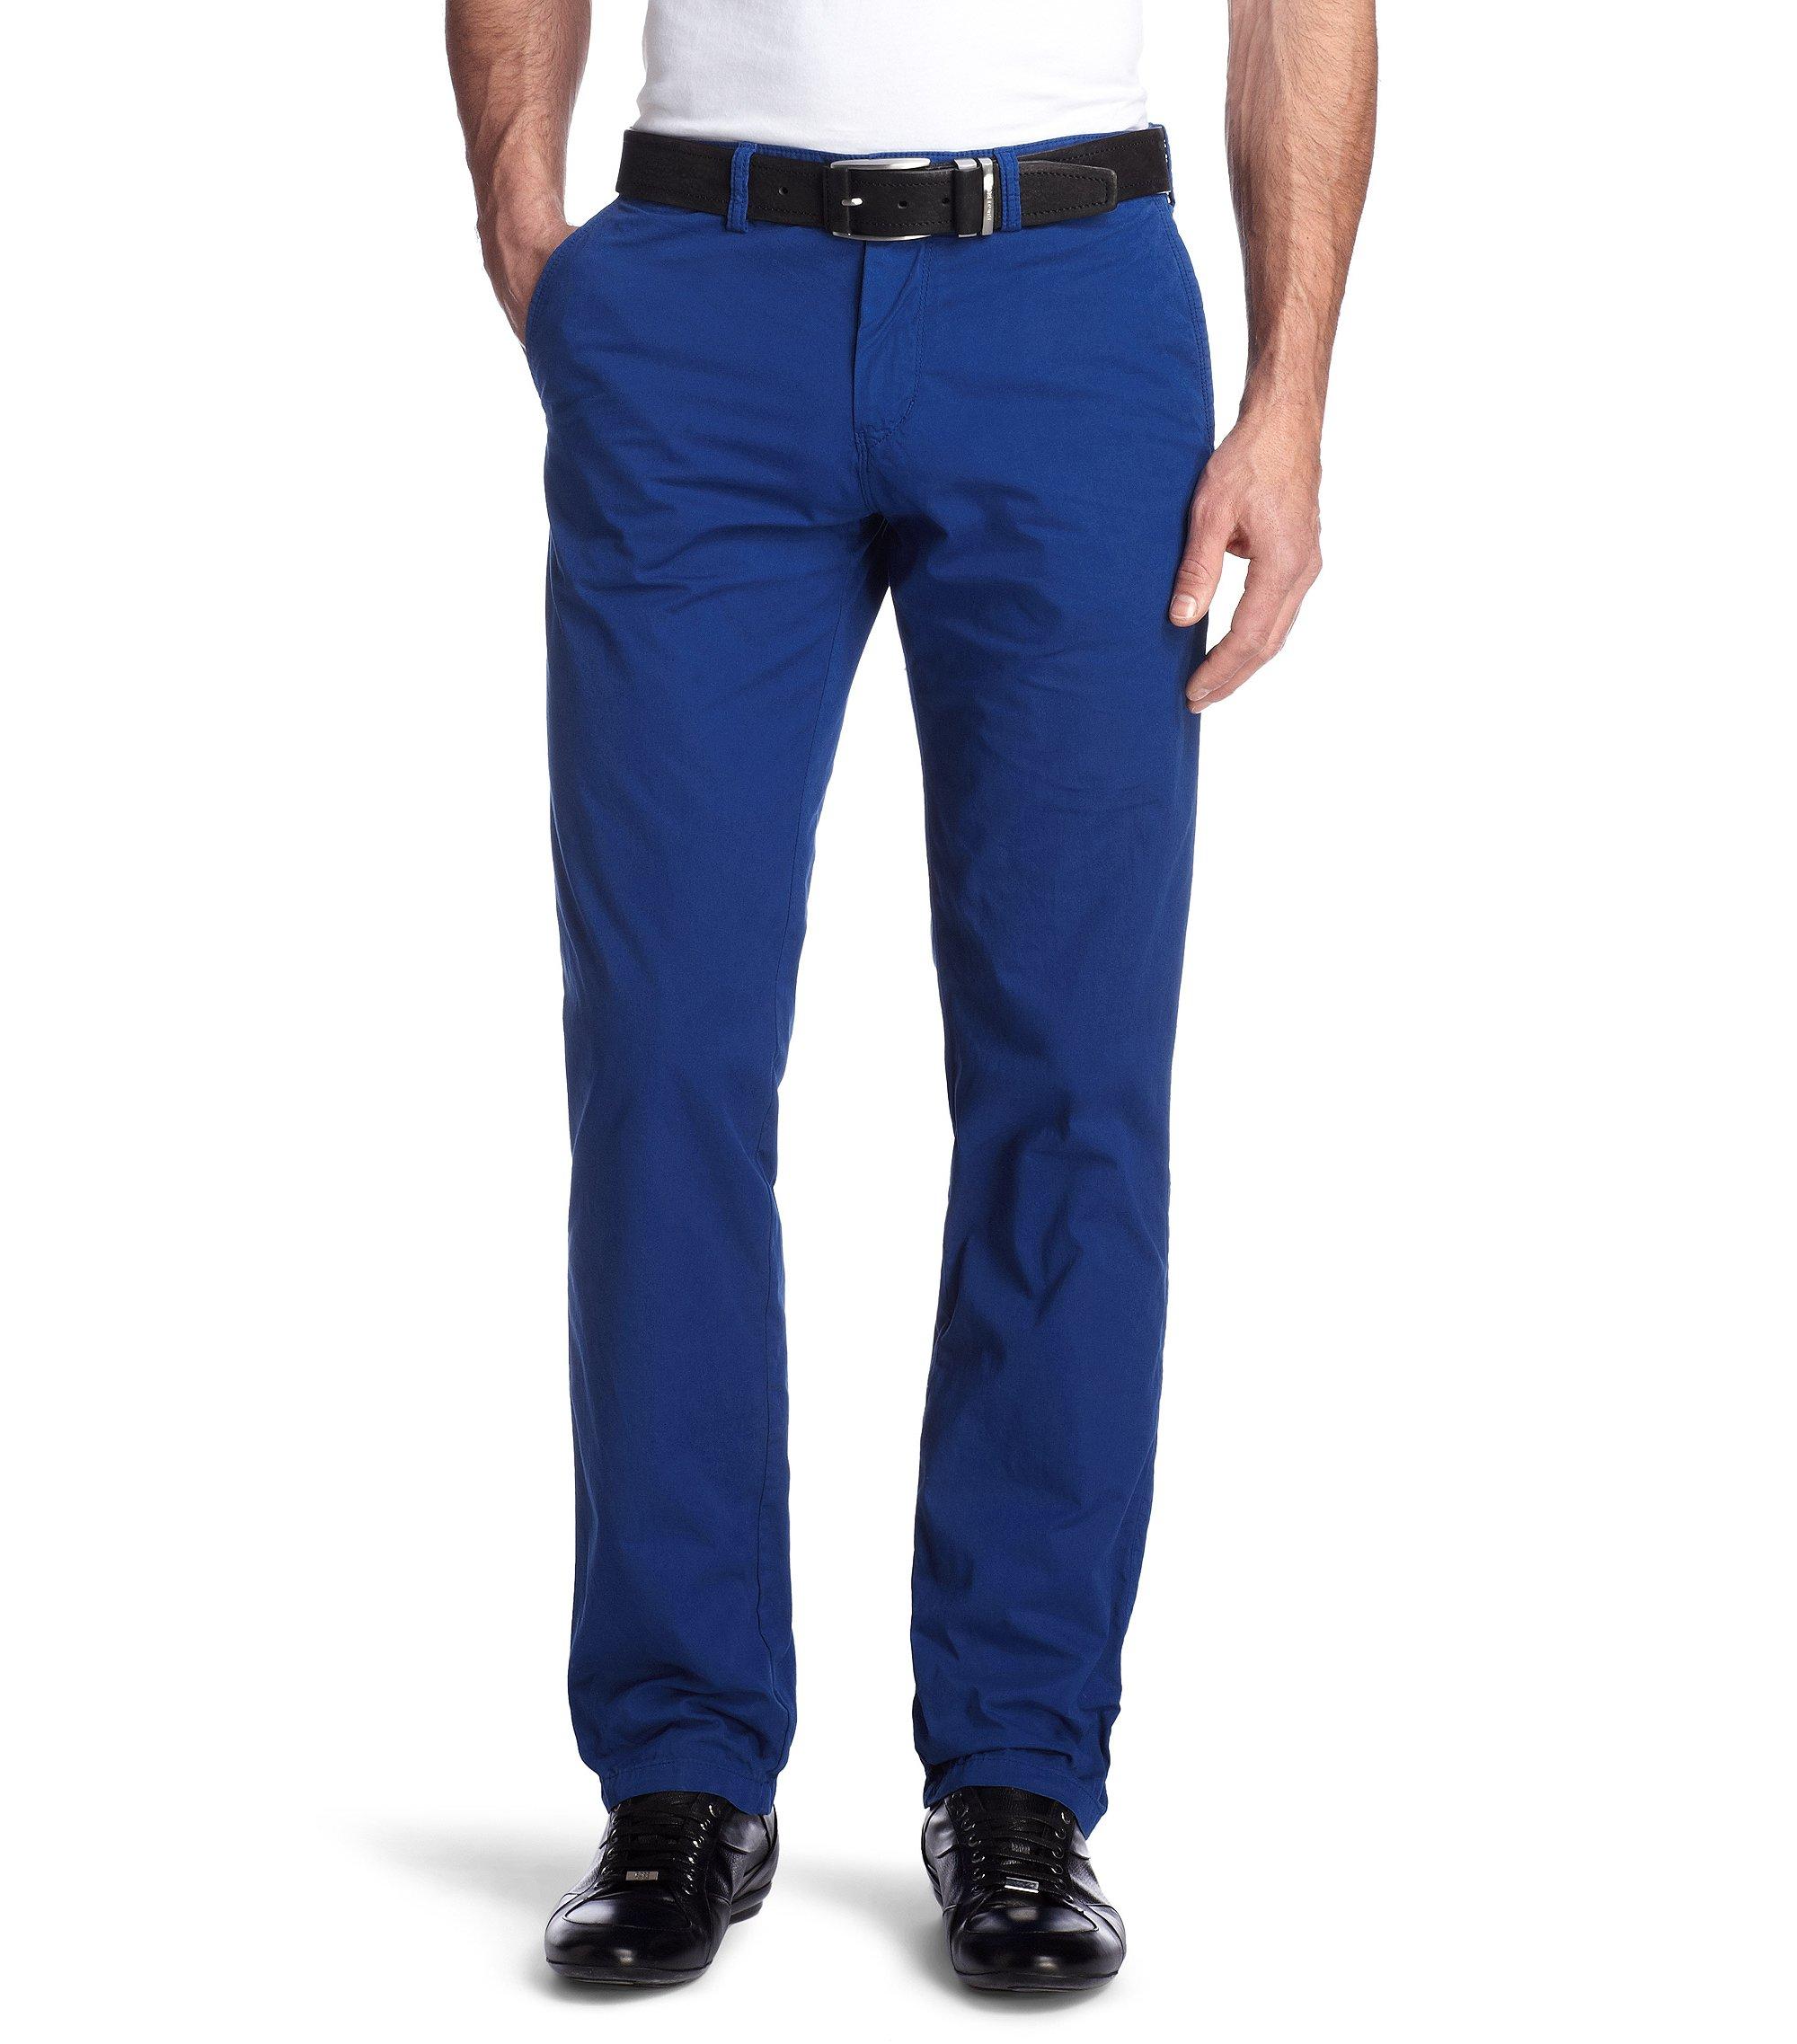 Regular-Fit Chino ´Crigan1-11-D`, Blau